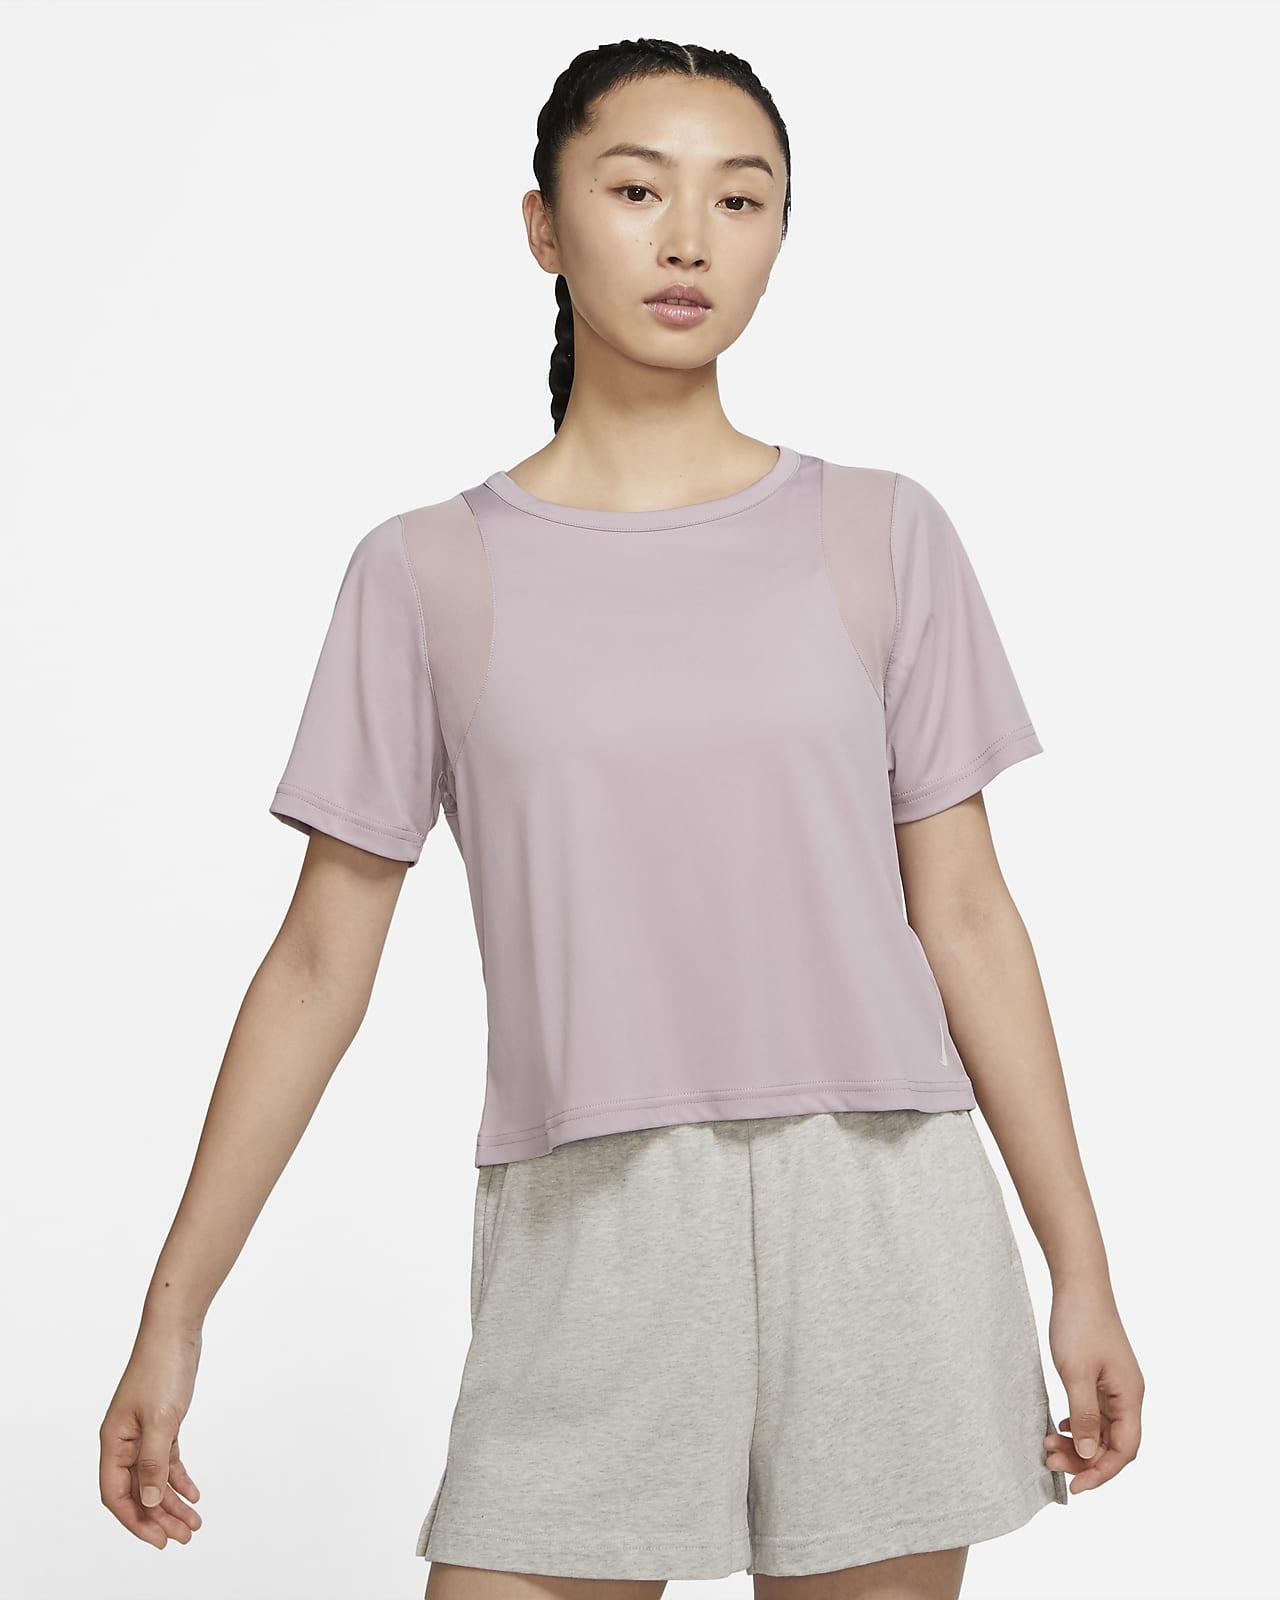 Nike Yoga Dri-FIT Mesh 女子短袖上衣